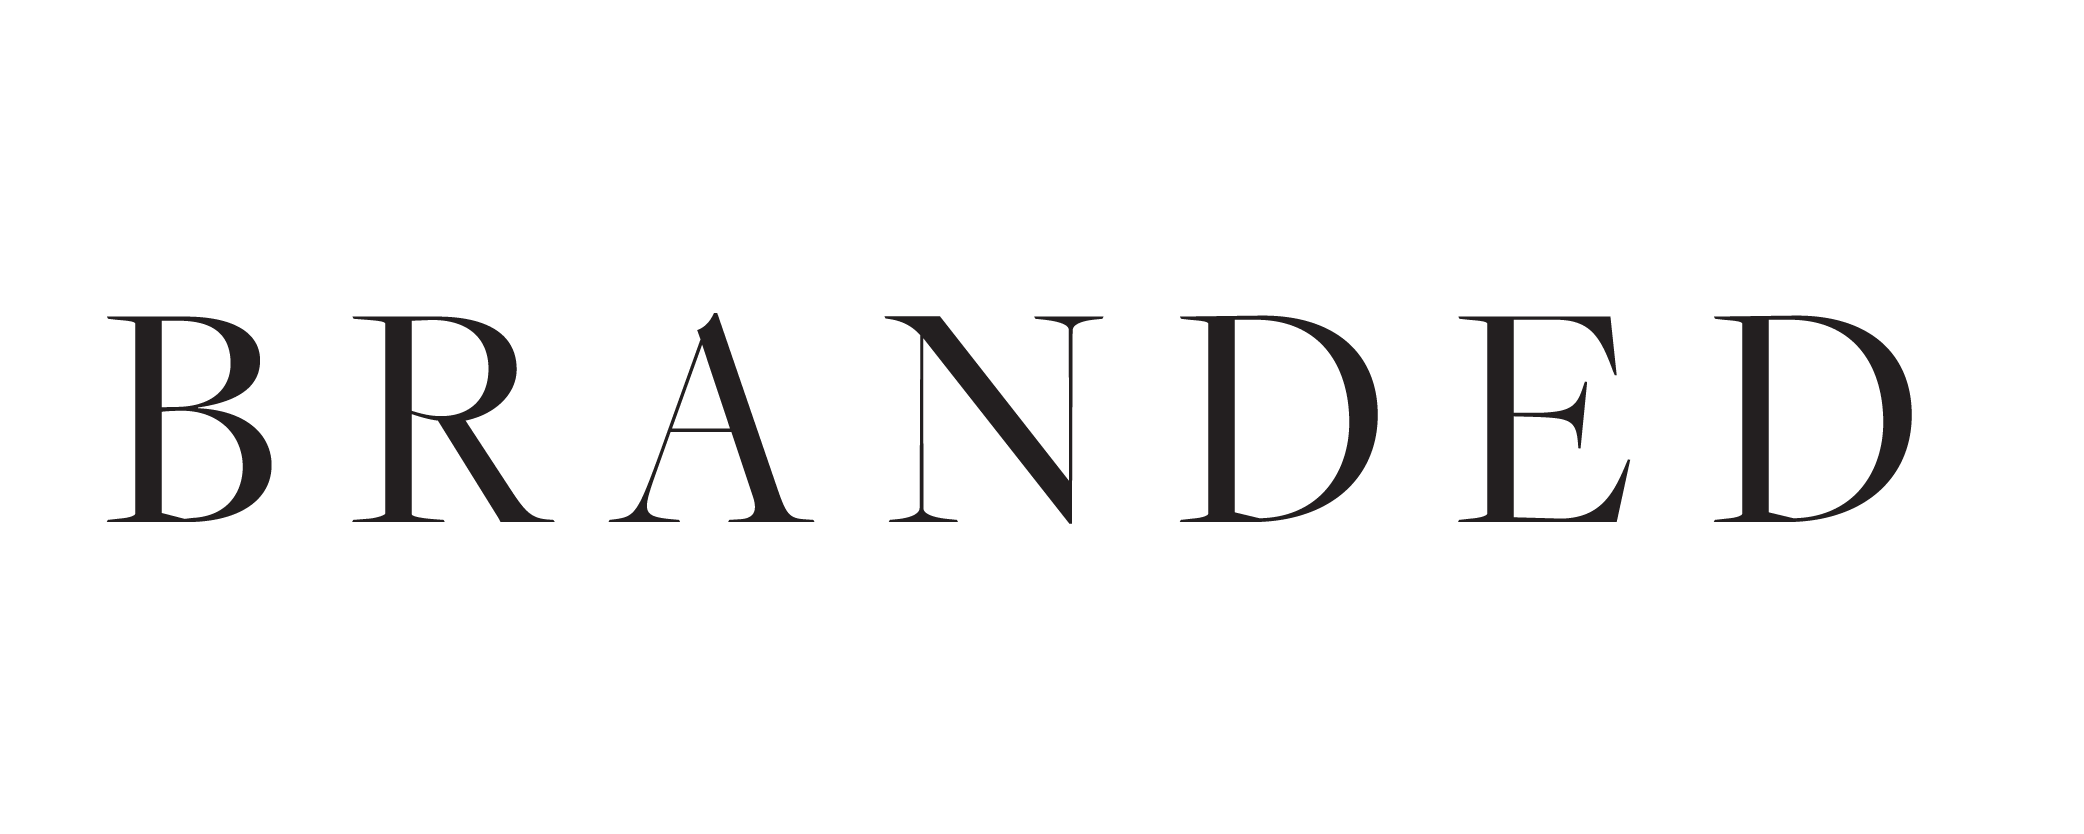 Branded_Branded_Merchandise_Agency-02